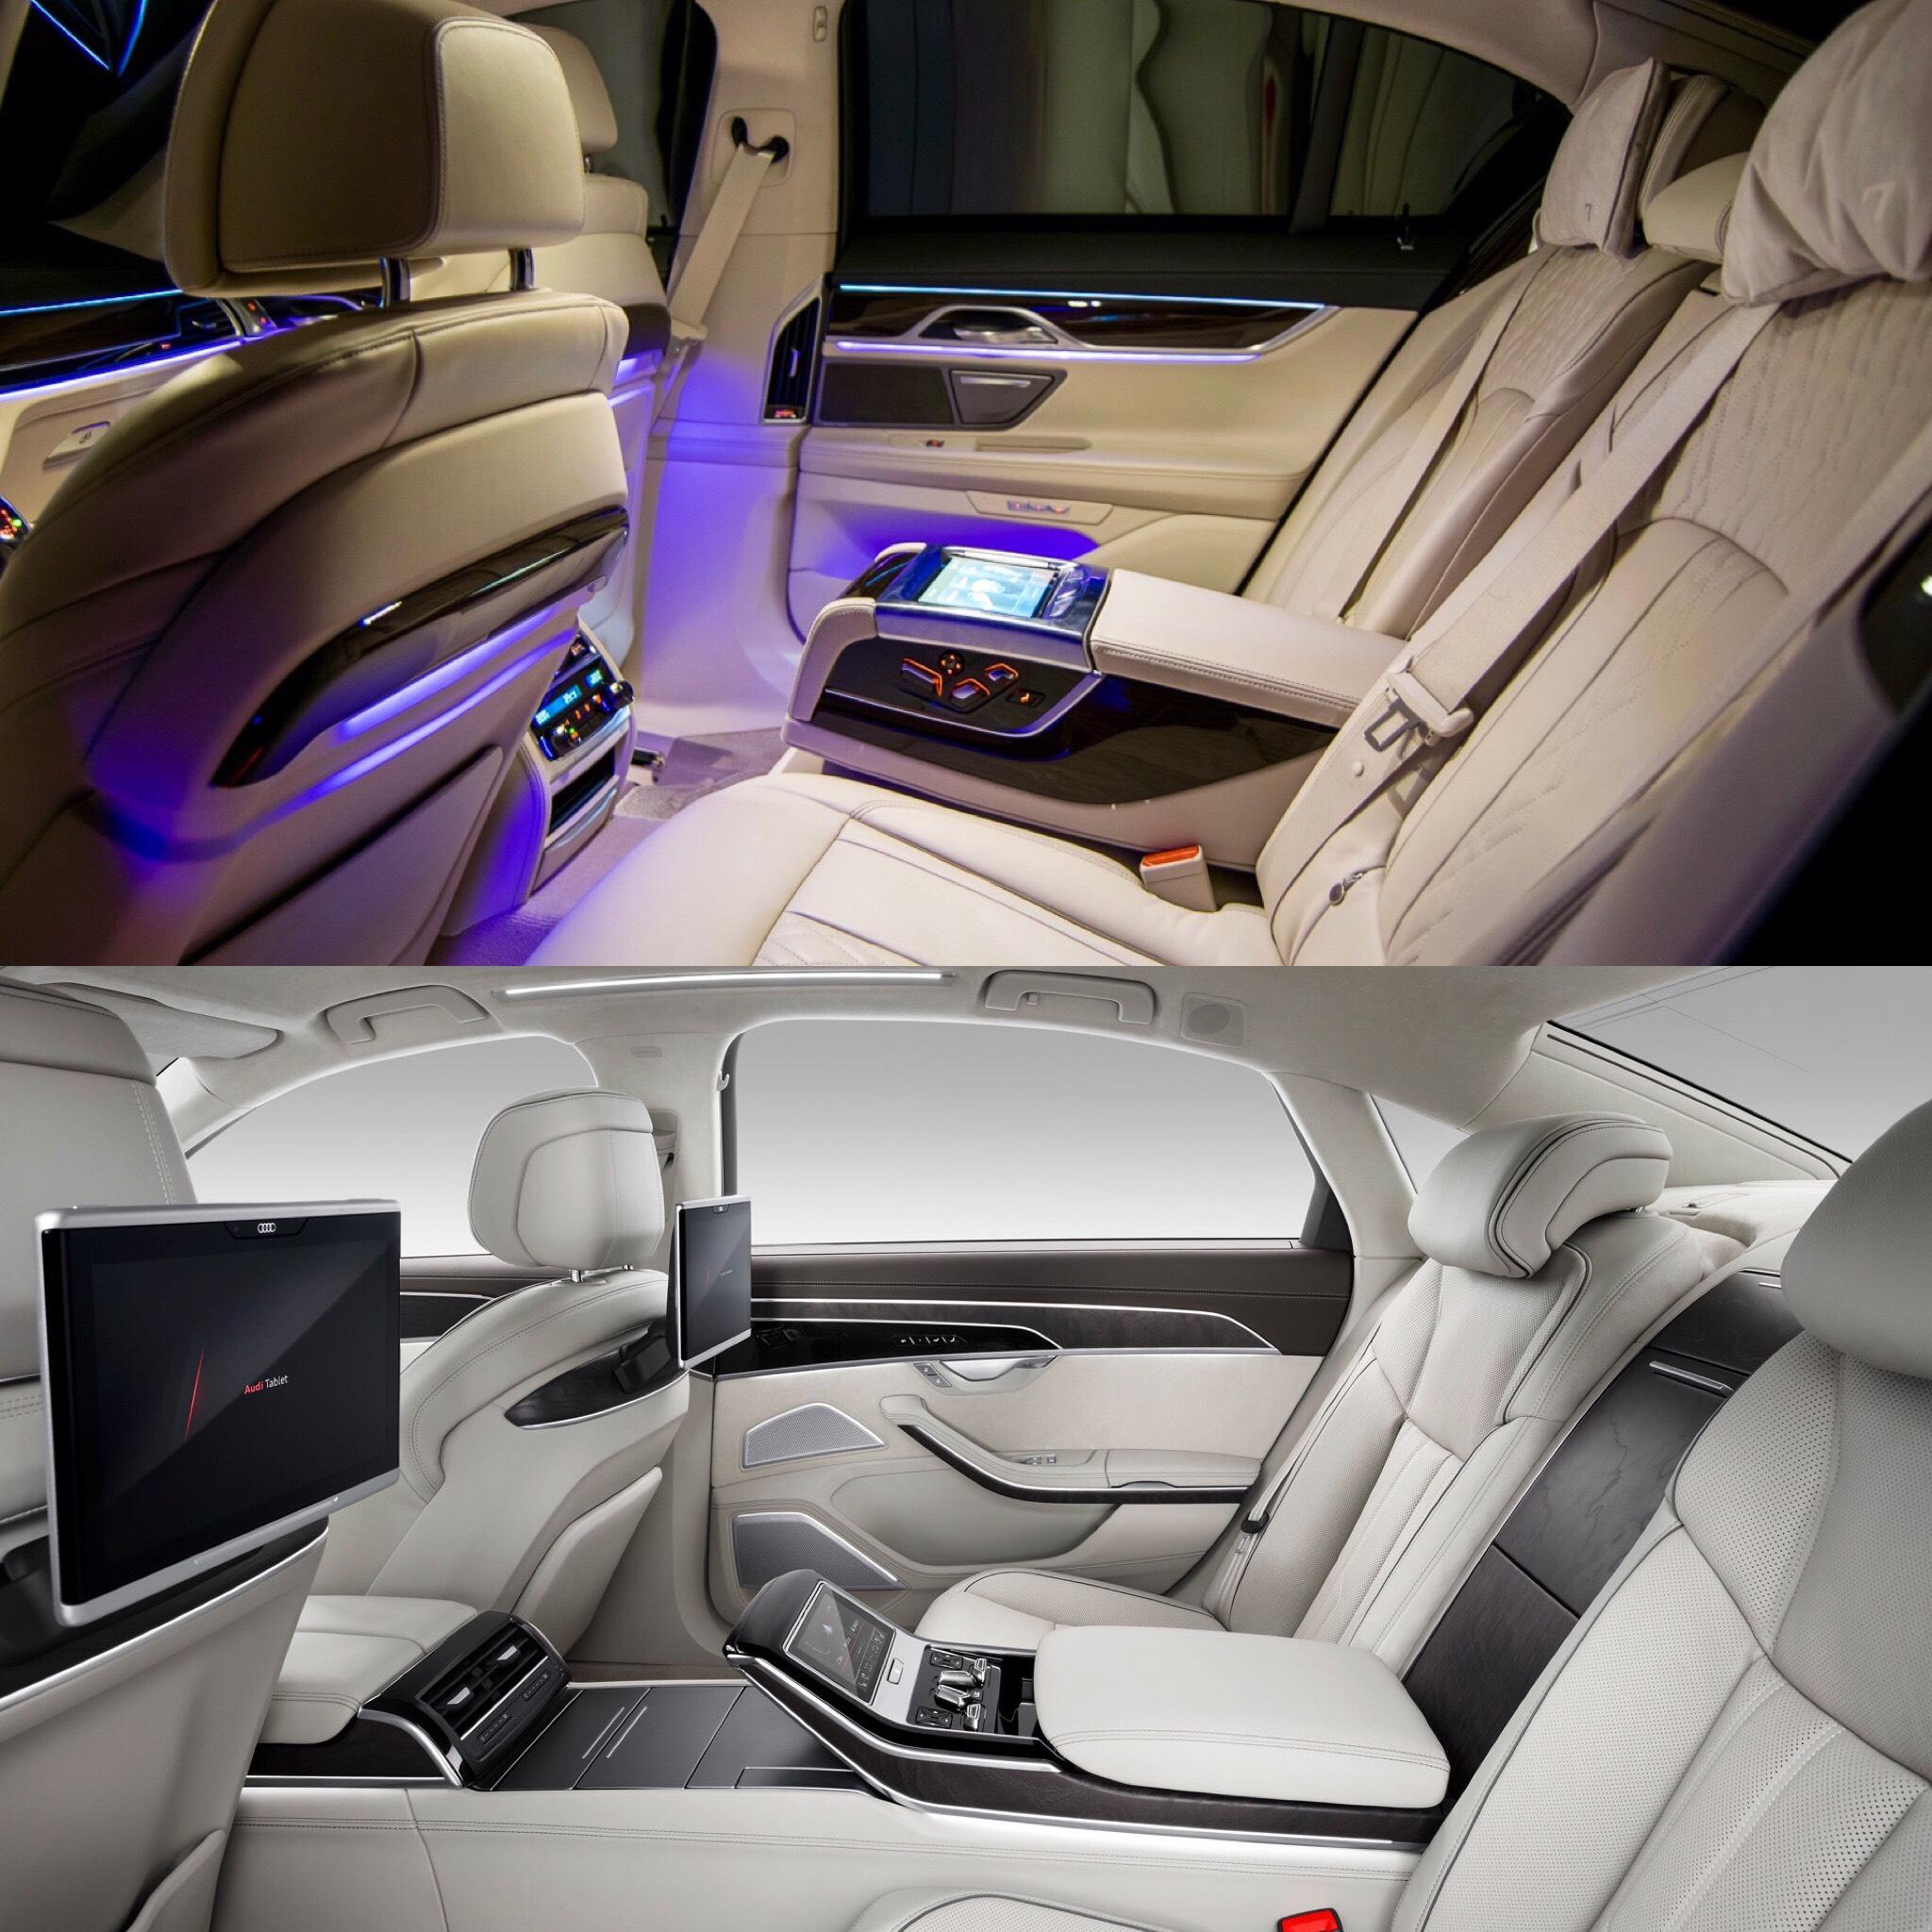 Photo Comparison: BMW 7 Series Vs 2018 Audi A8